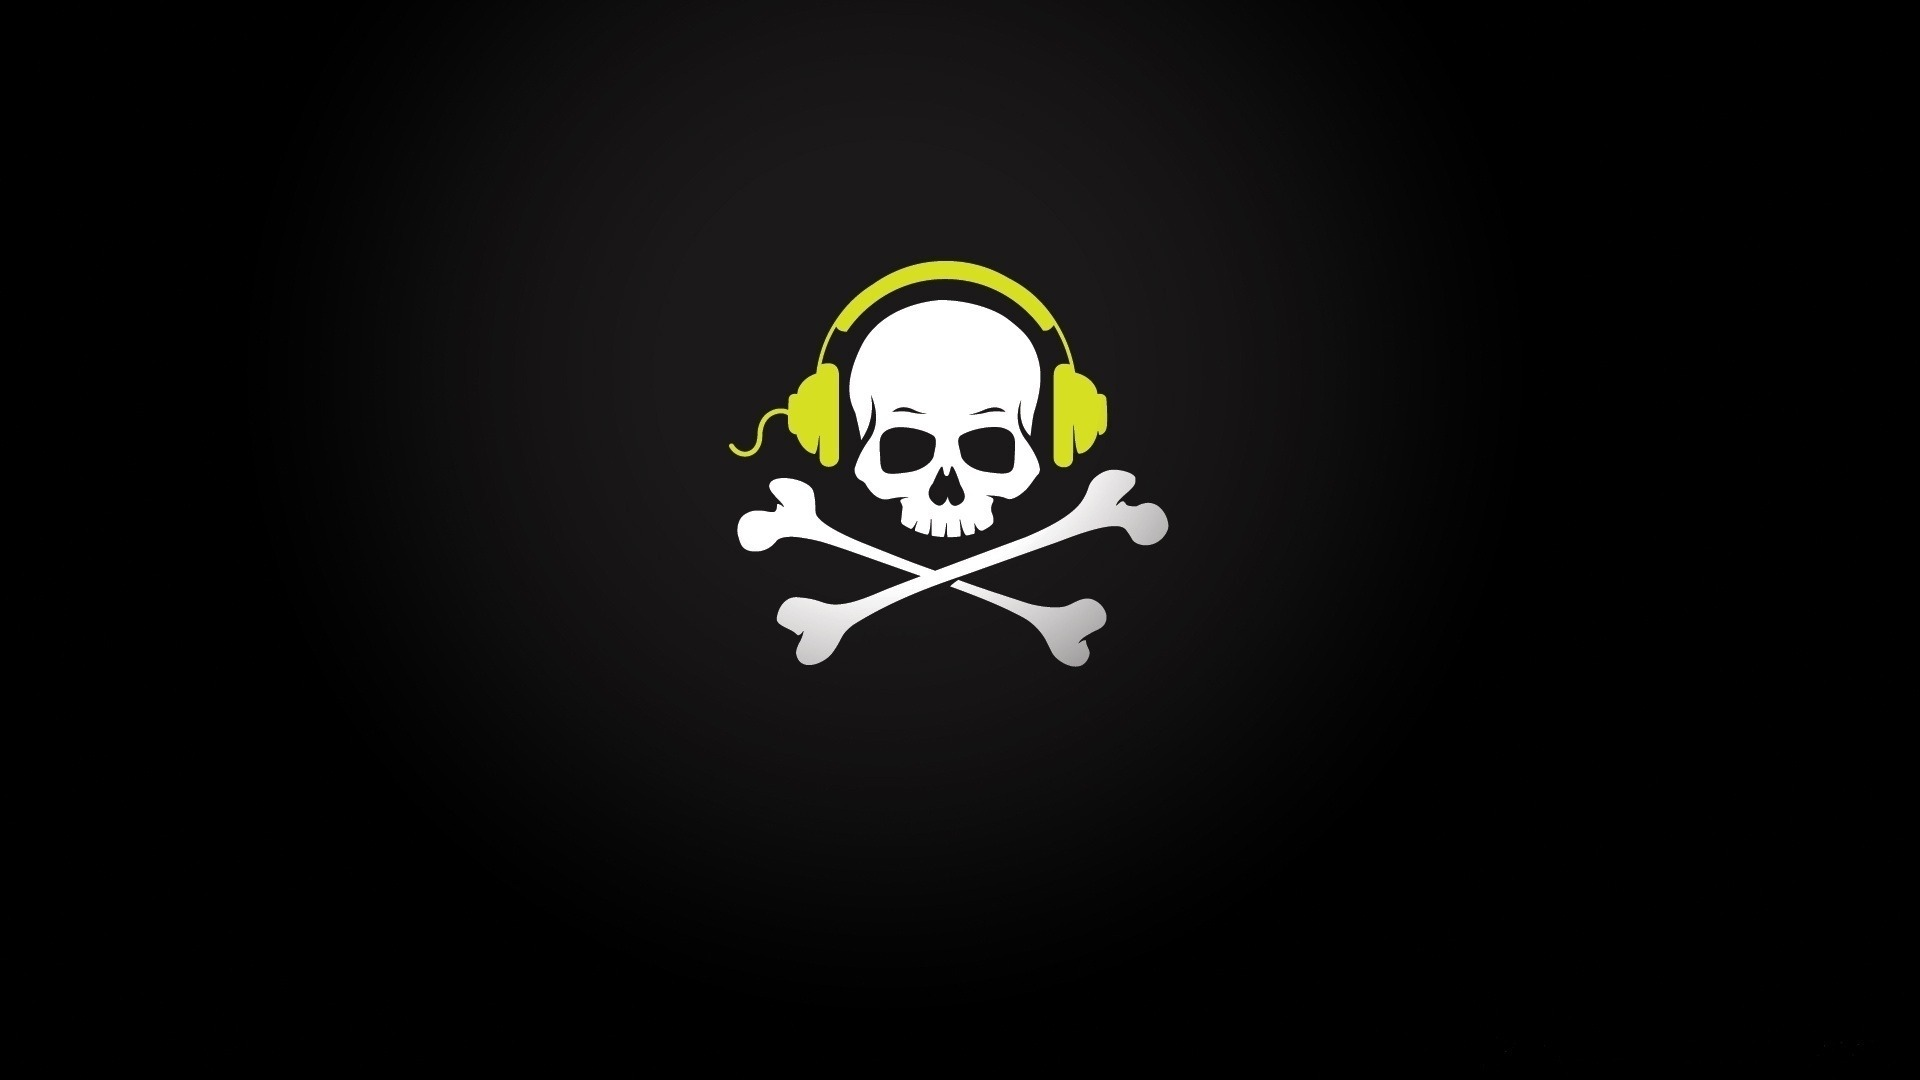 music-pirate-skull-wallpapers